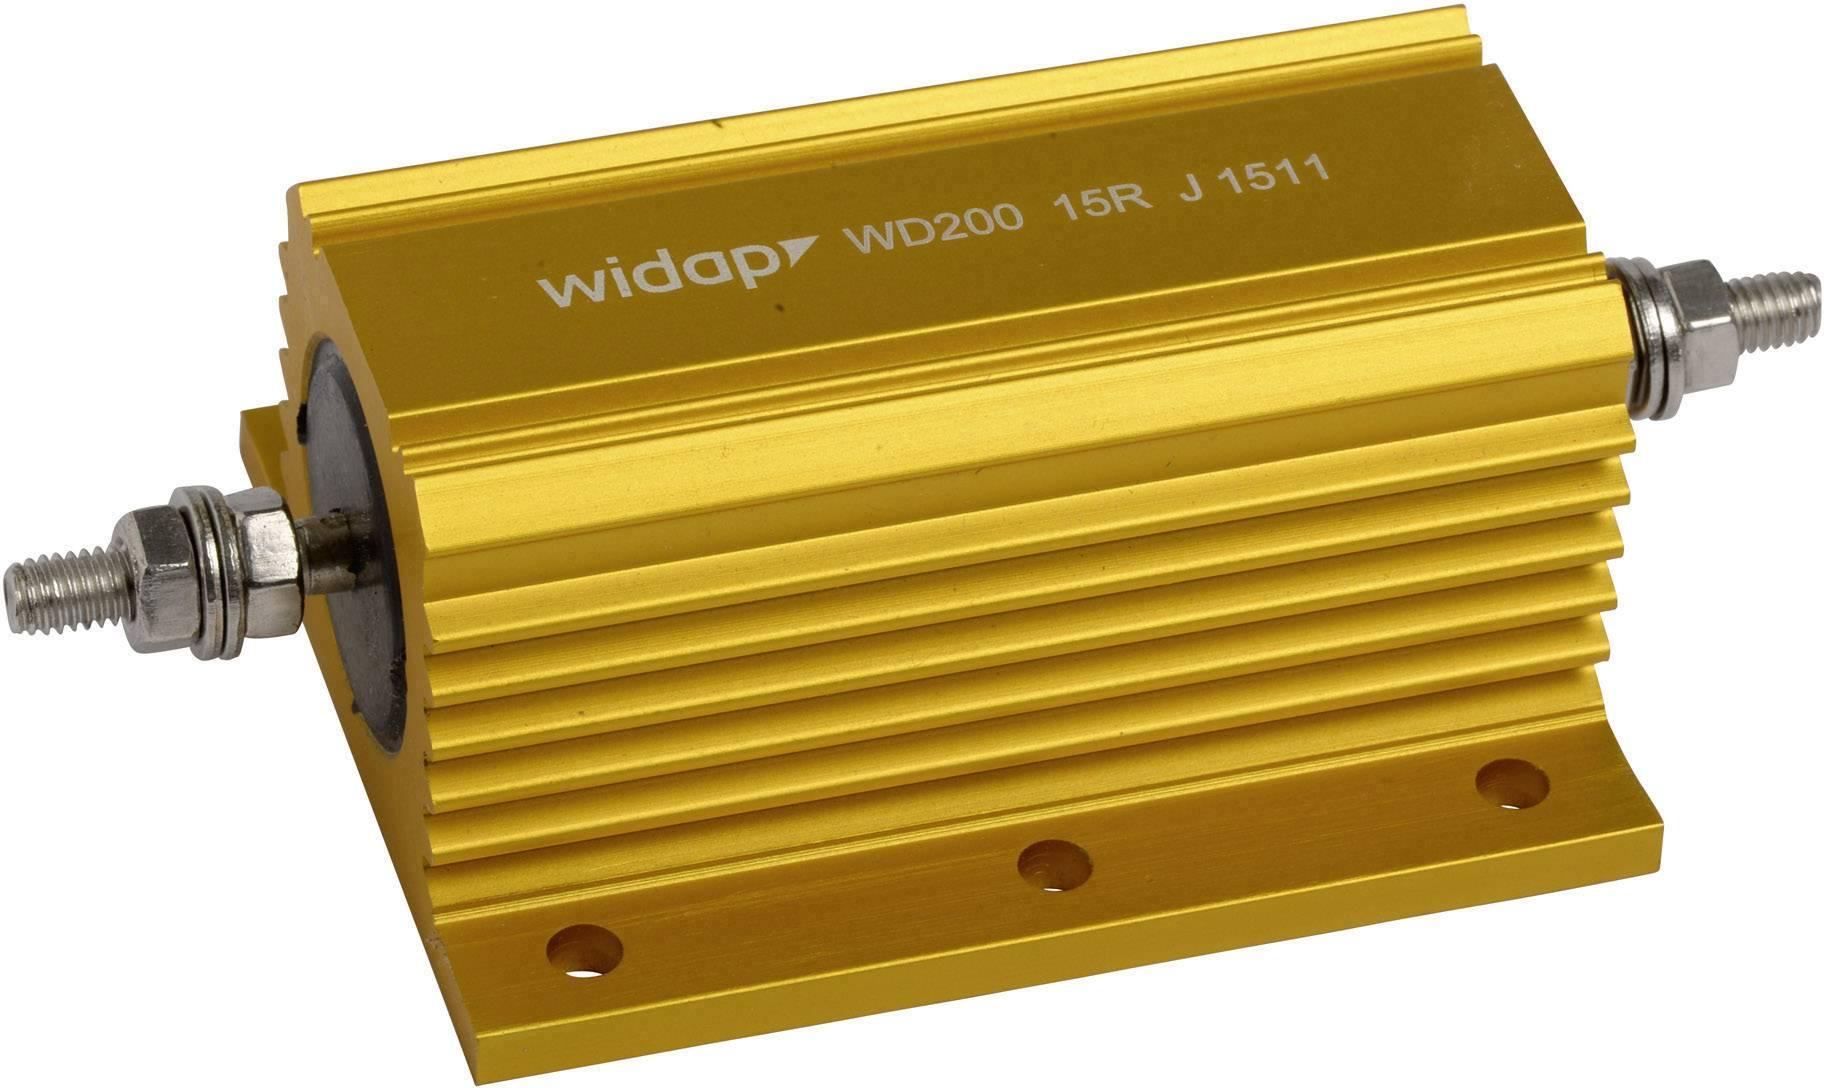 Drôtový rezistor Widap 160162, hodnota odporu 560 Ohm, 200 W, 1 ks